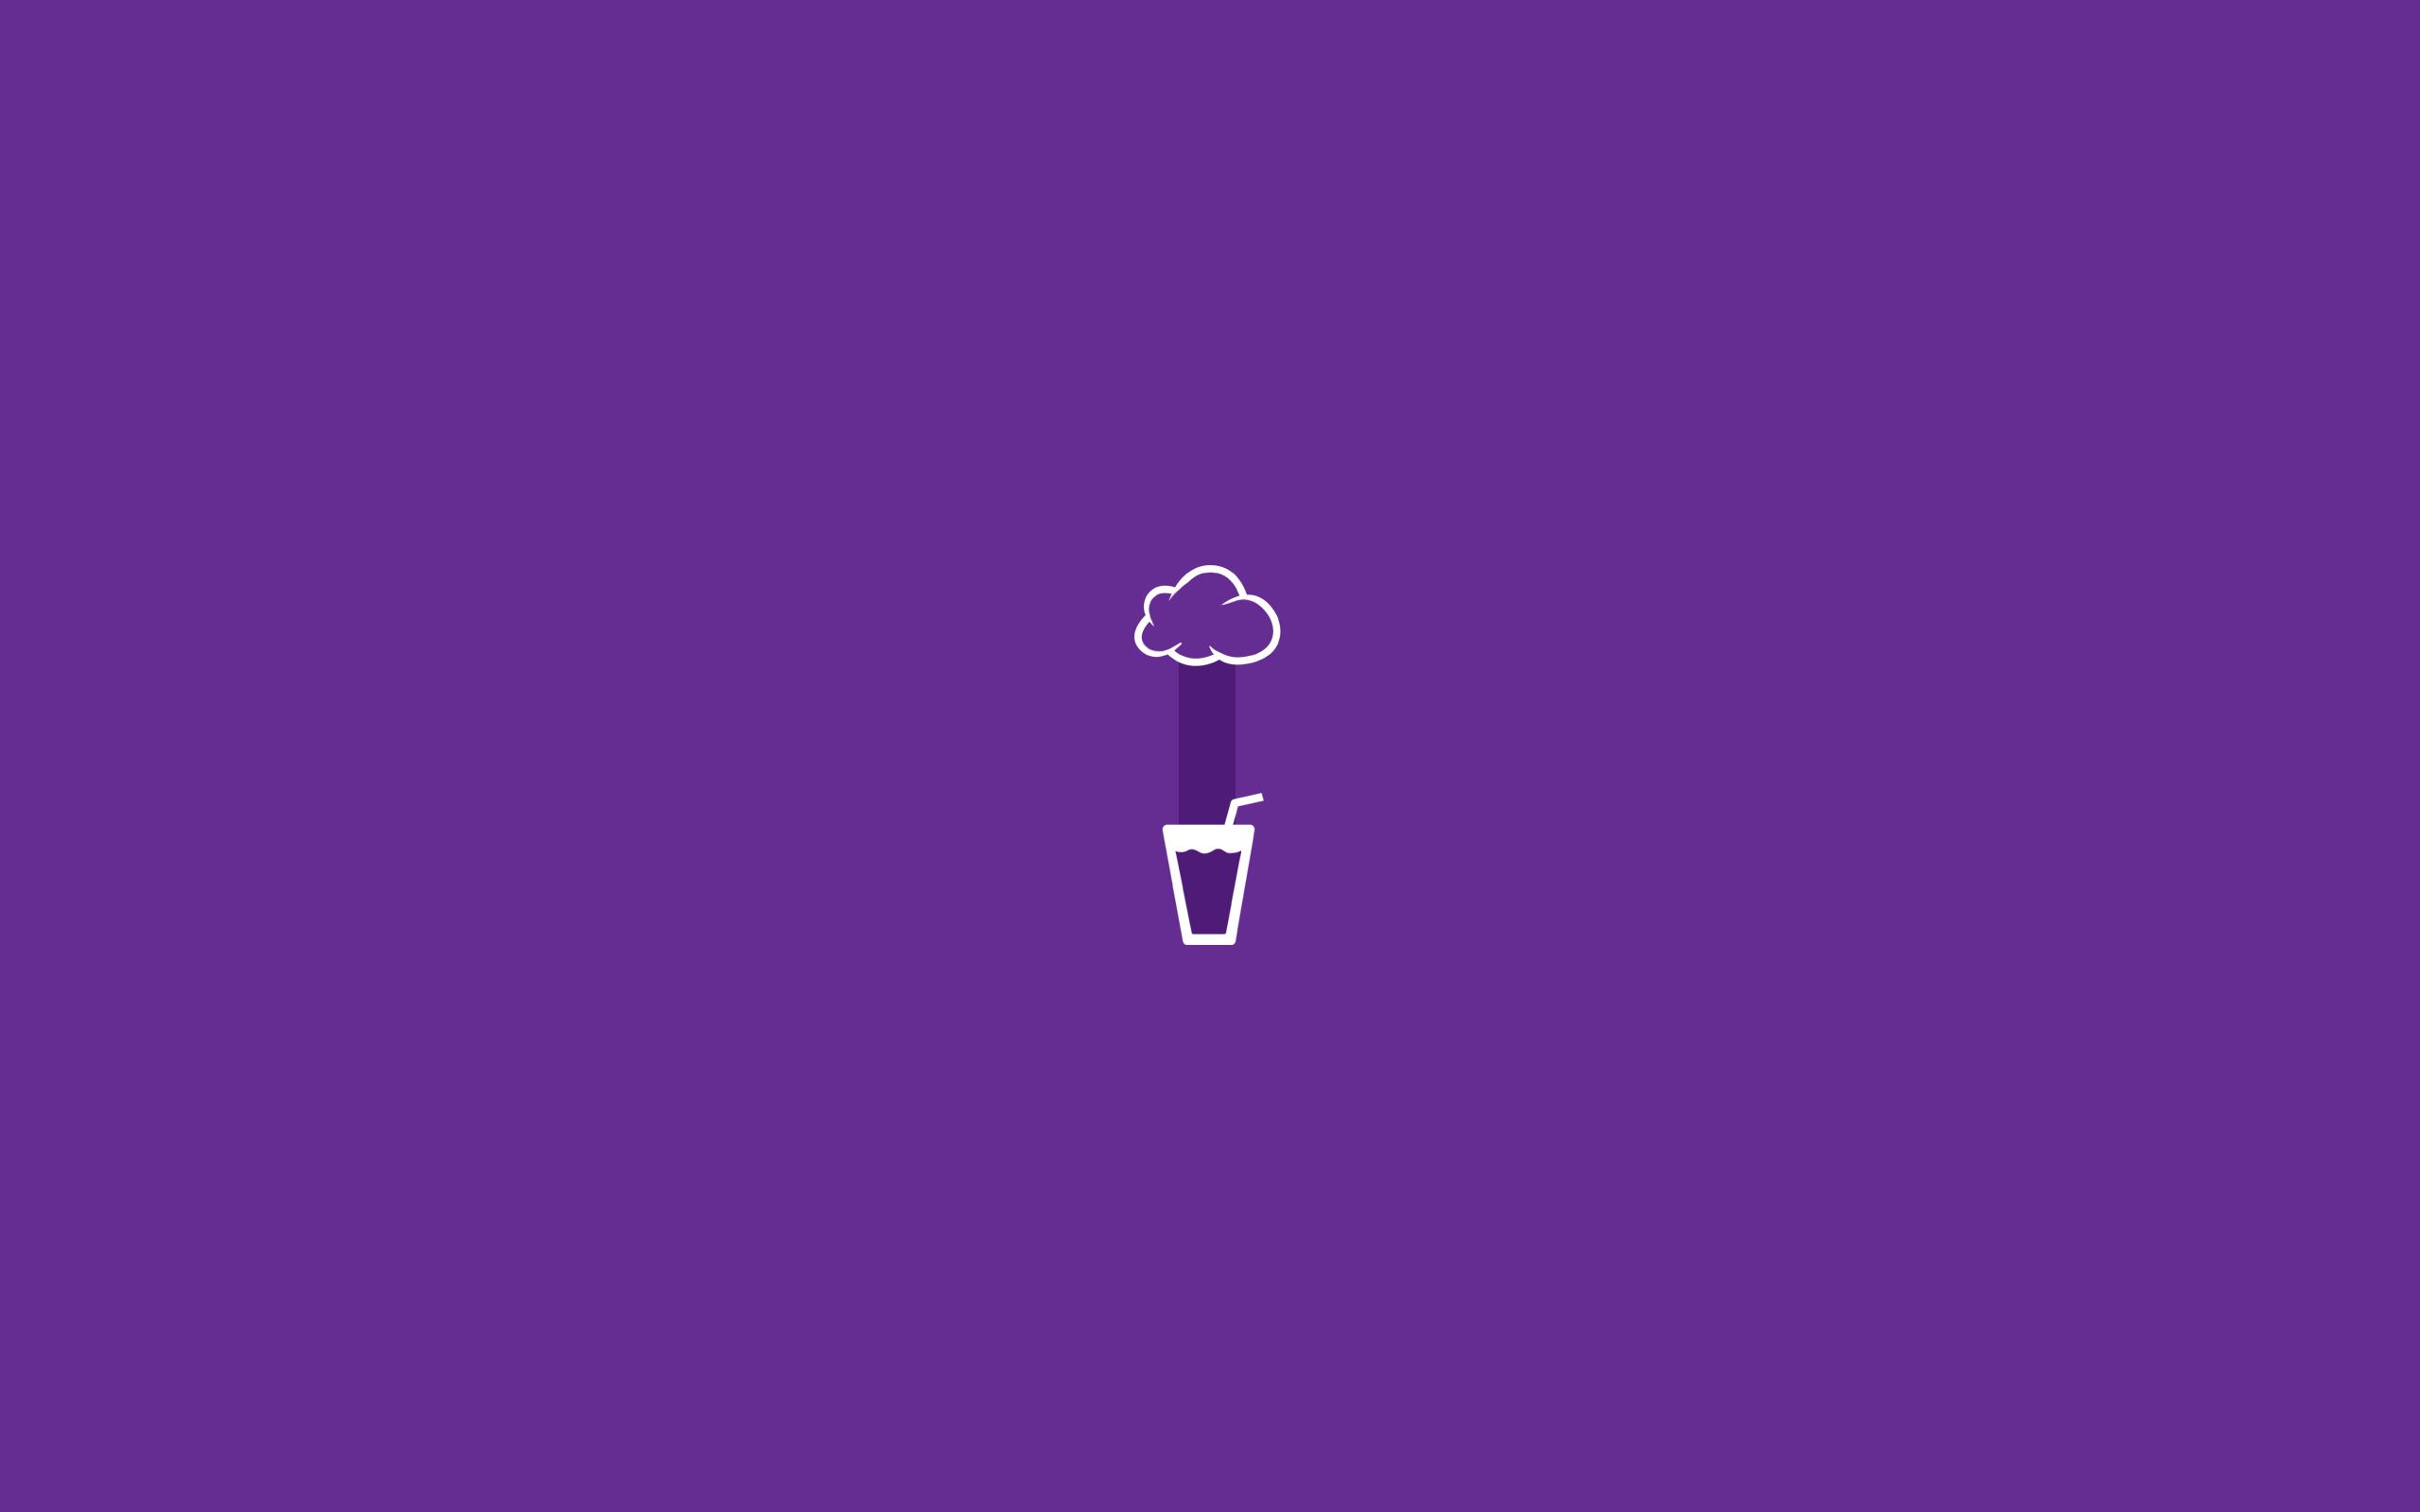 Minimalist Purple Wallpapers Top Free Minimalist Purple Backgrounds Wallpaperaccess